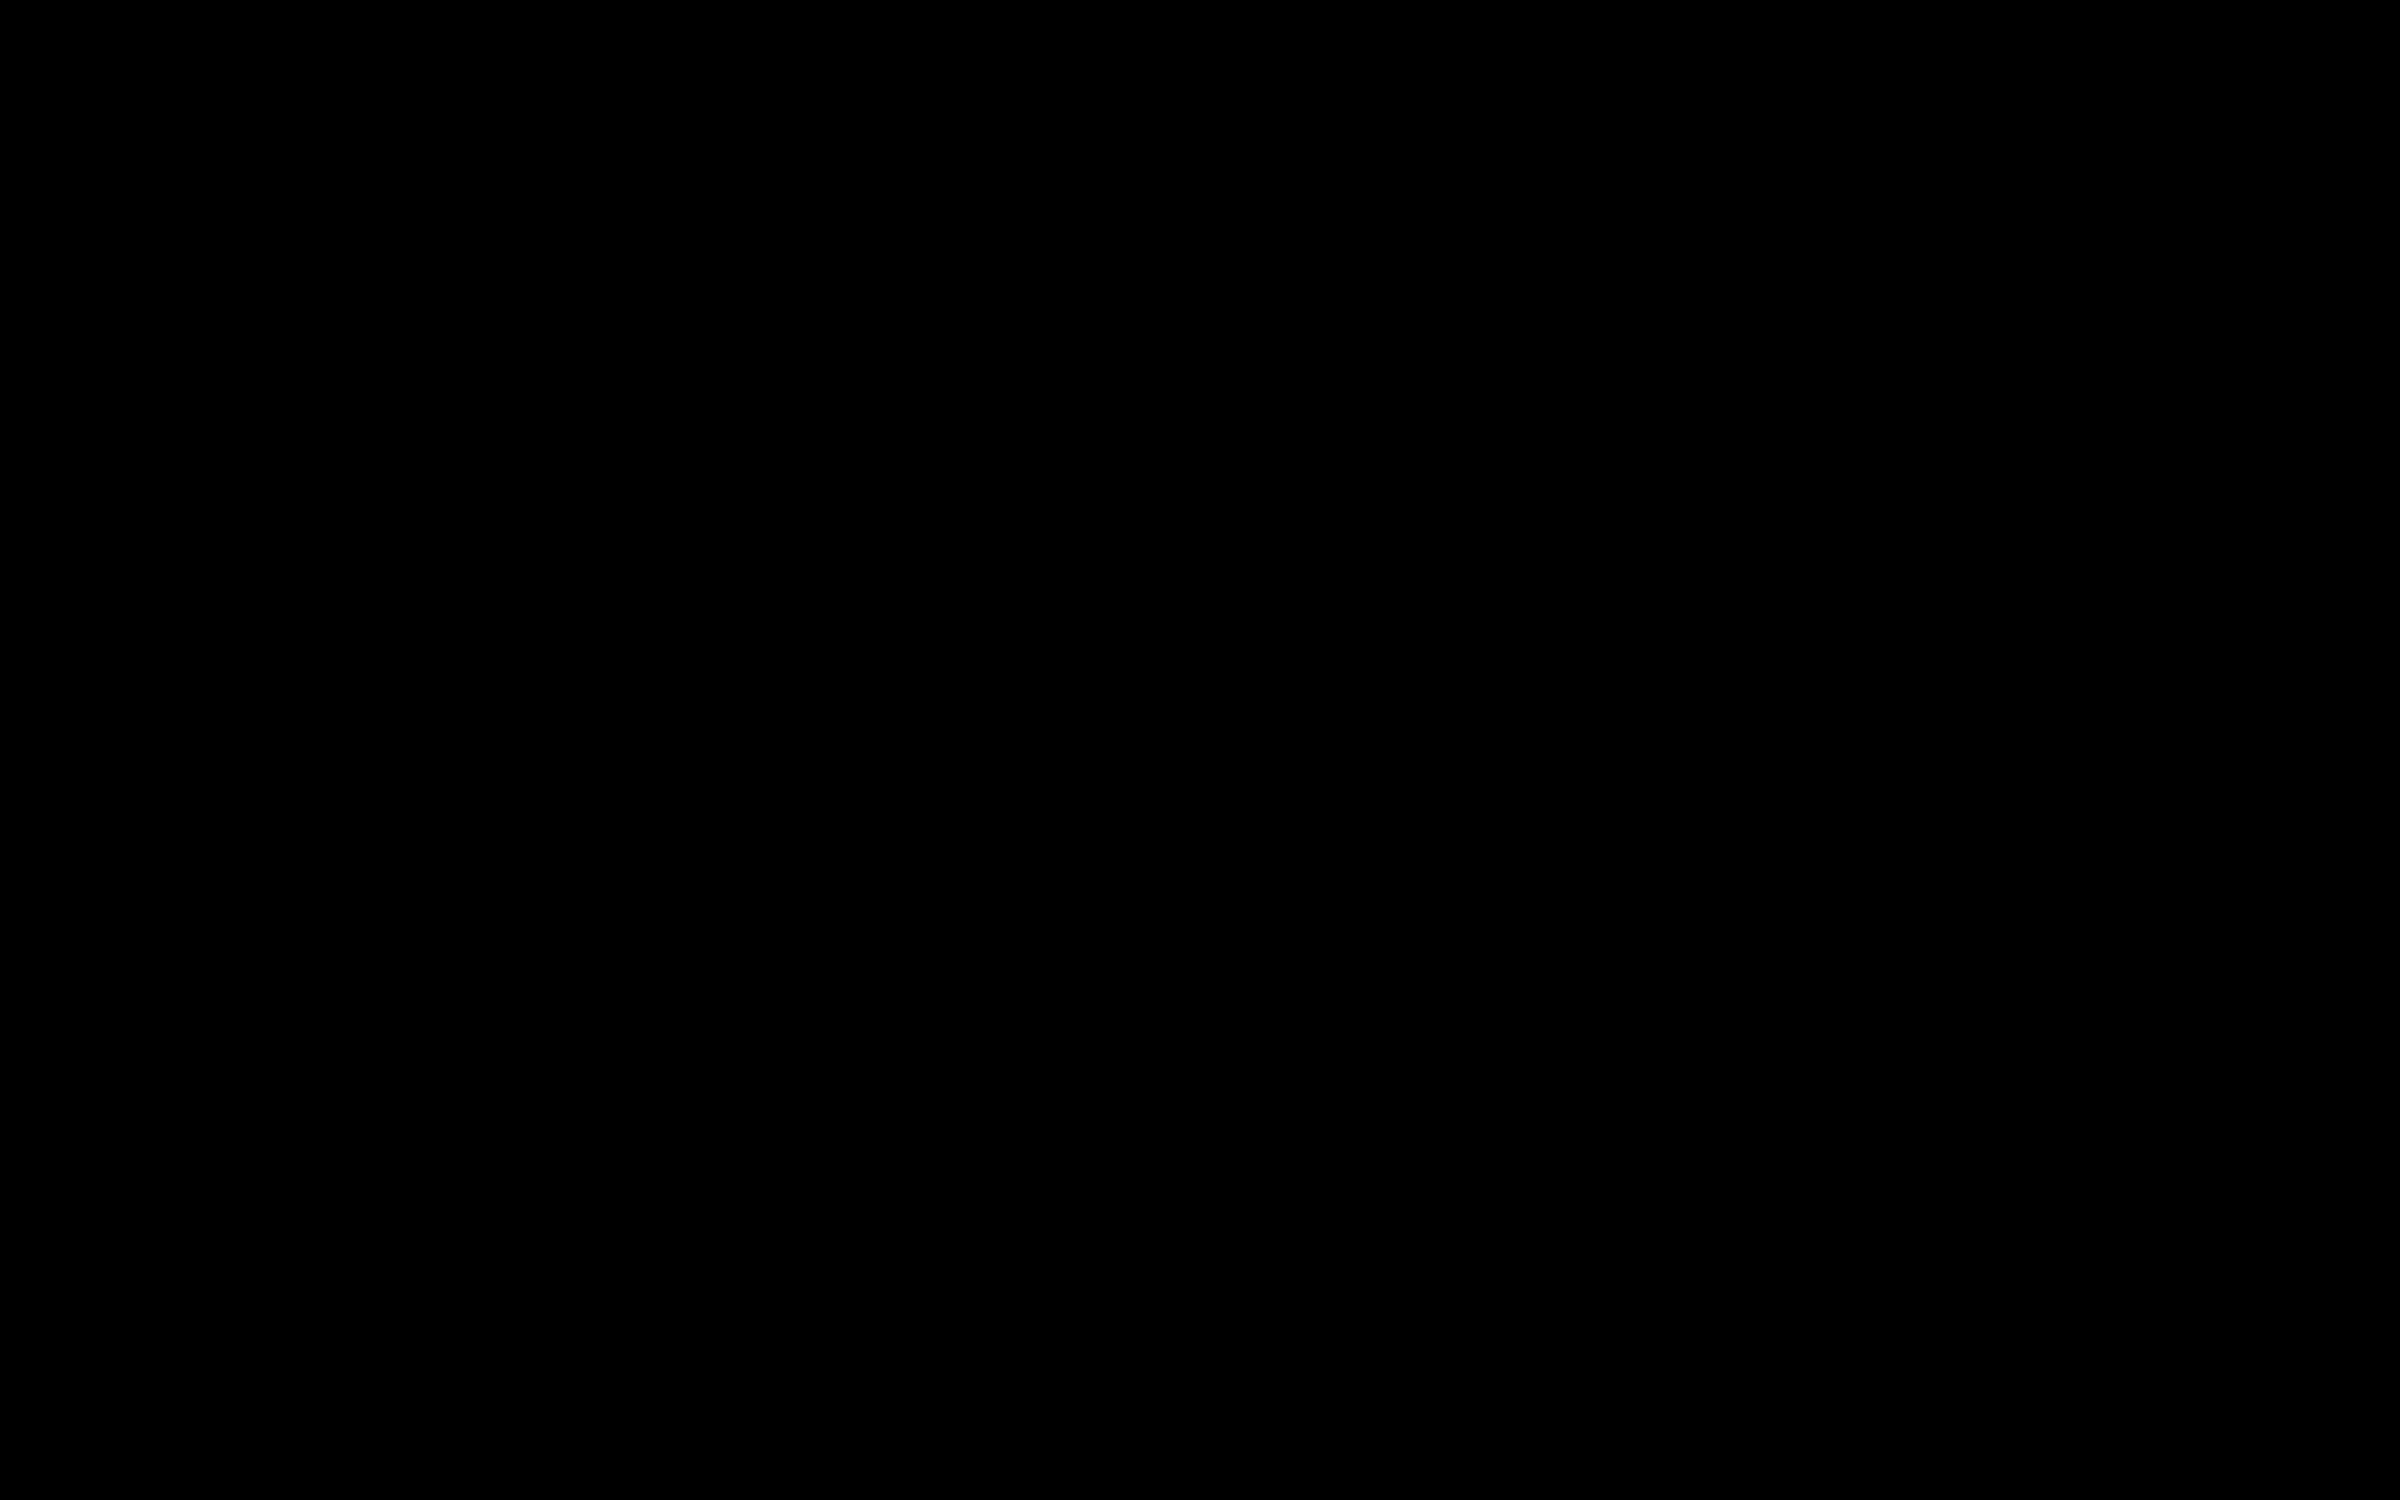 Rencontres Xxx Site Plancul / Fille Ukkel